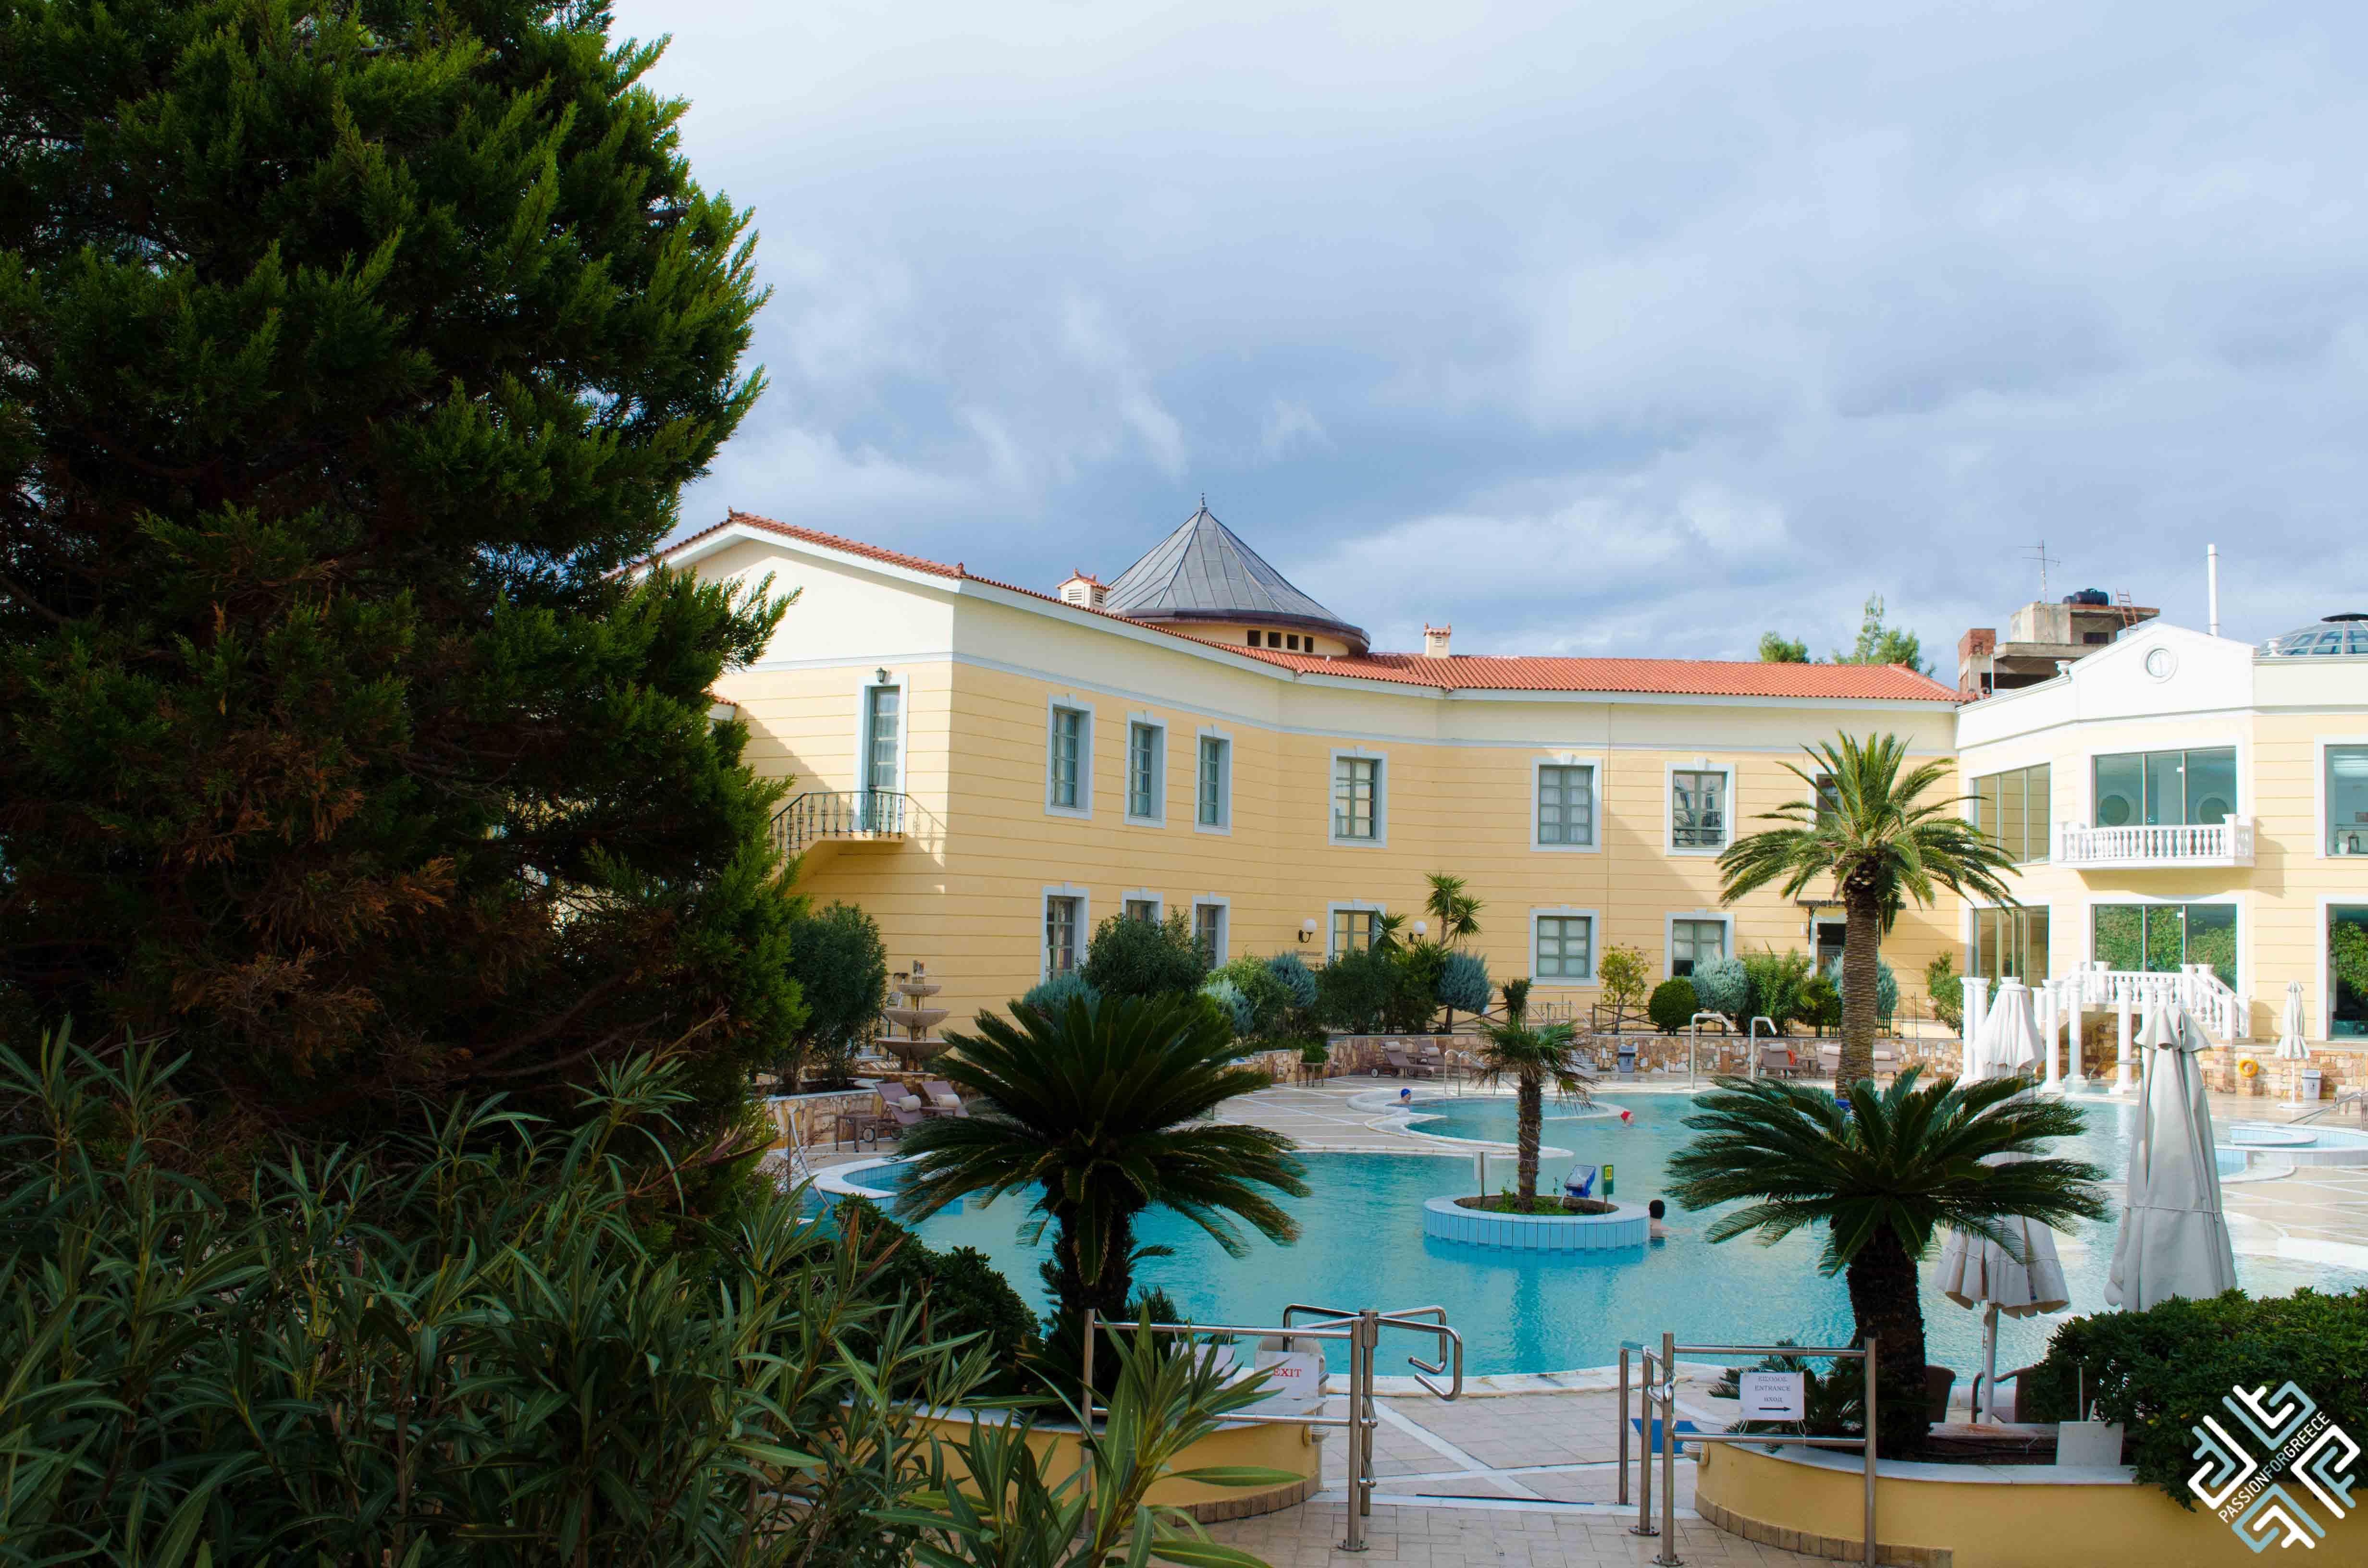 thermae_sylla-wellness_hotel-greece-3